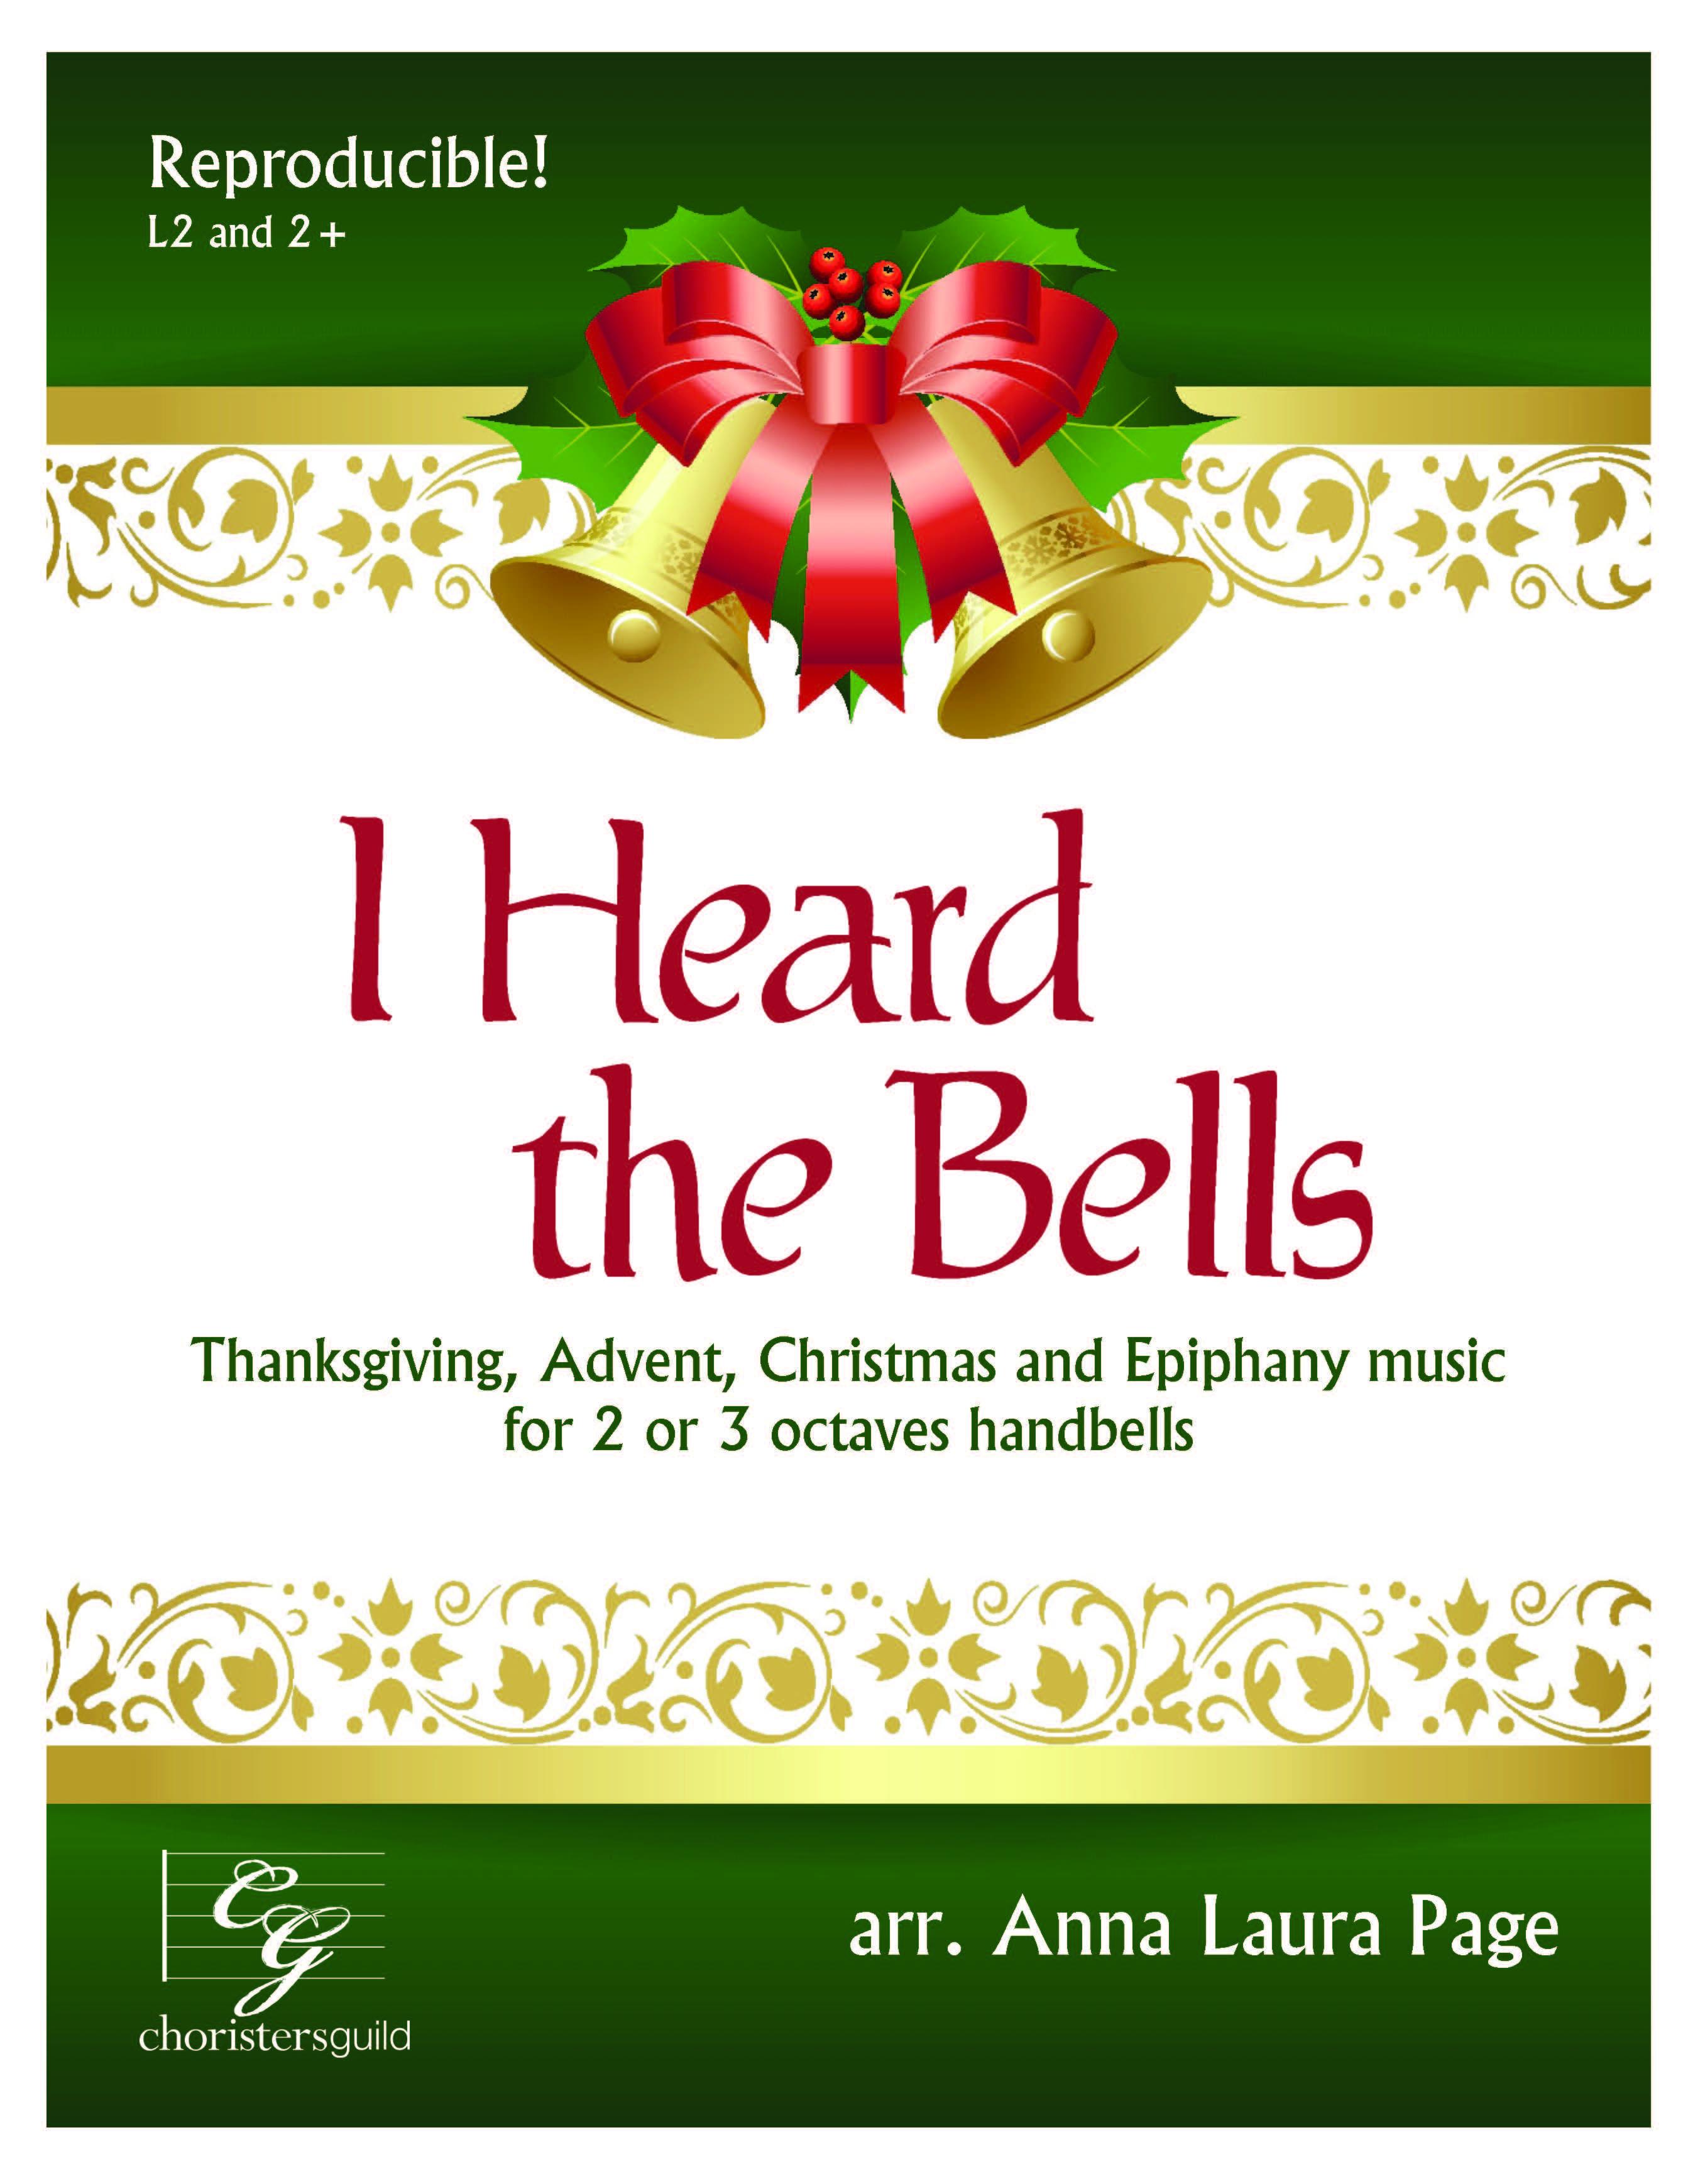 I Heard the Bells (Digital) - 2 or 3 octaves